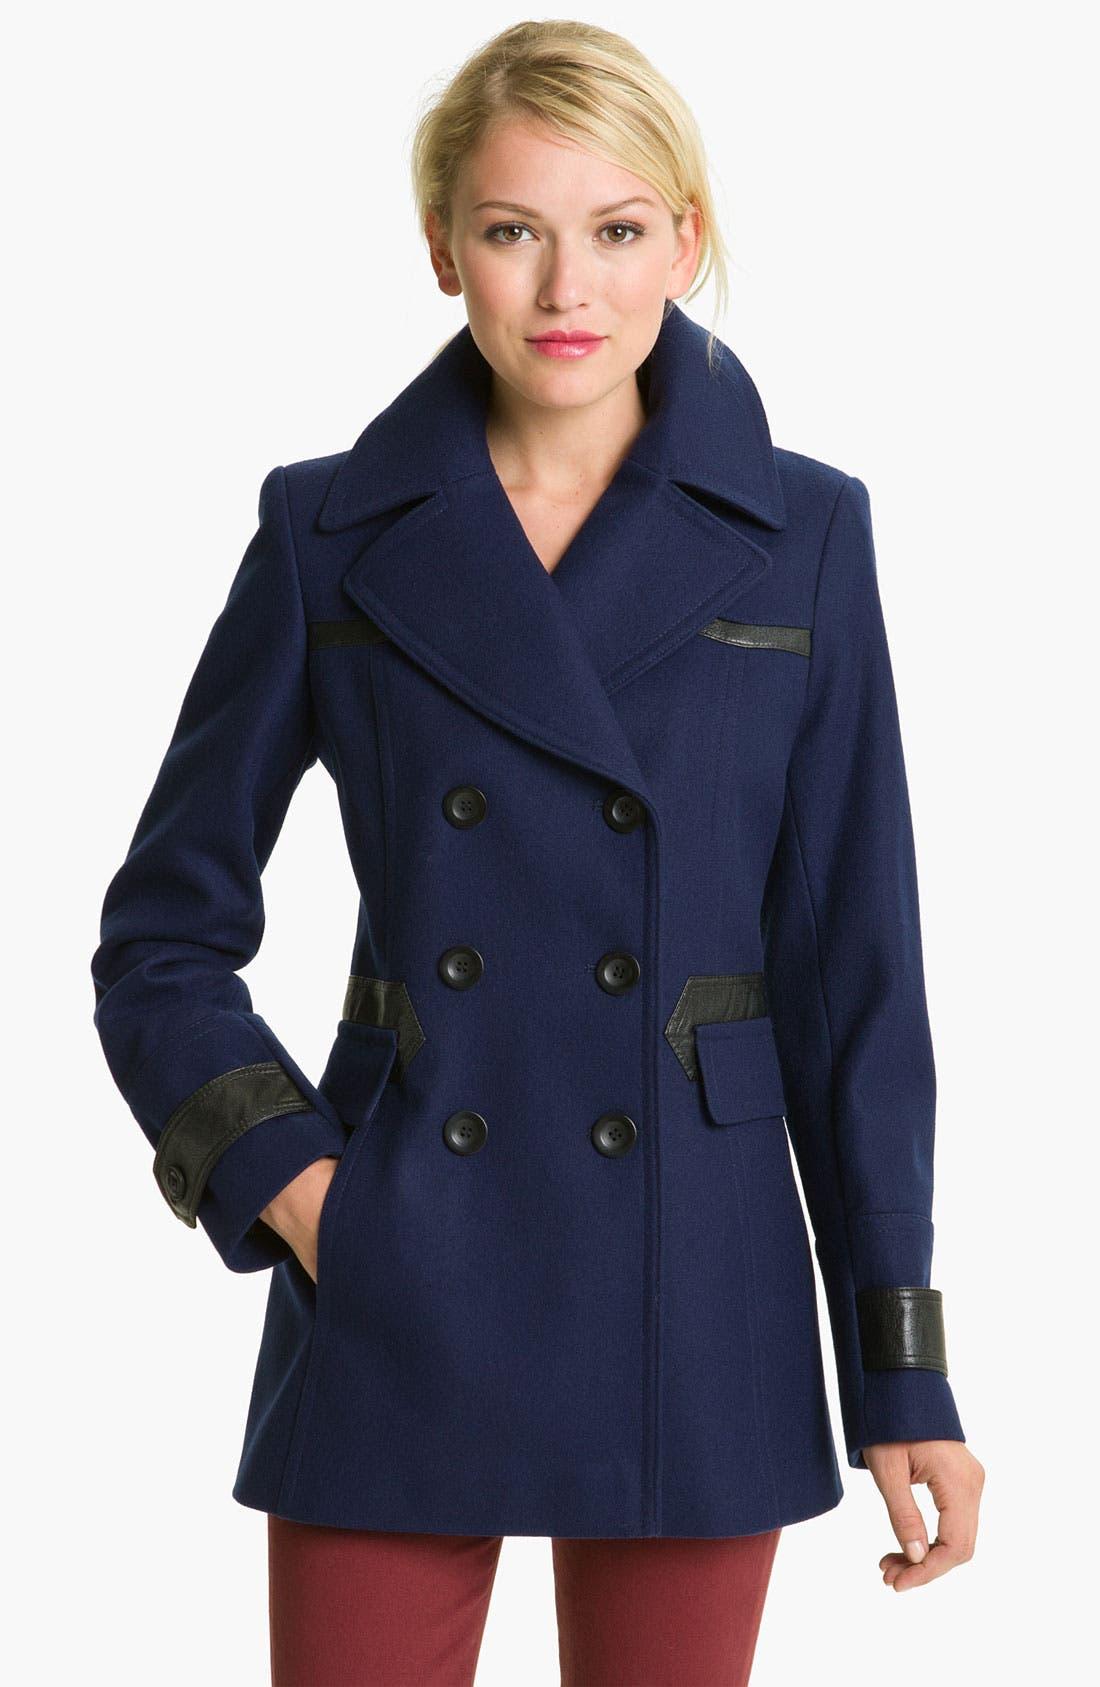 Alternate Image 1 Selected - Via Spiga 'Elena' Faux Leather Trim Wool Blend Coat